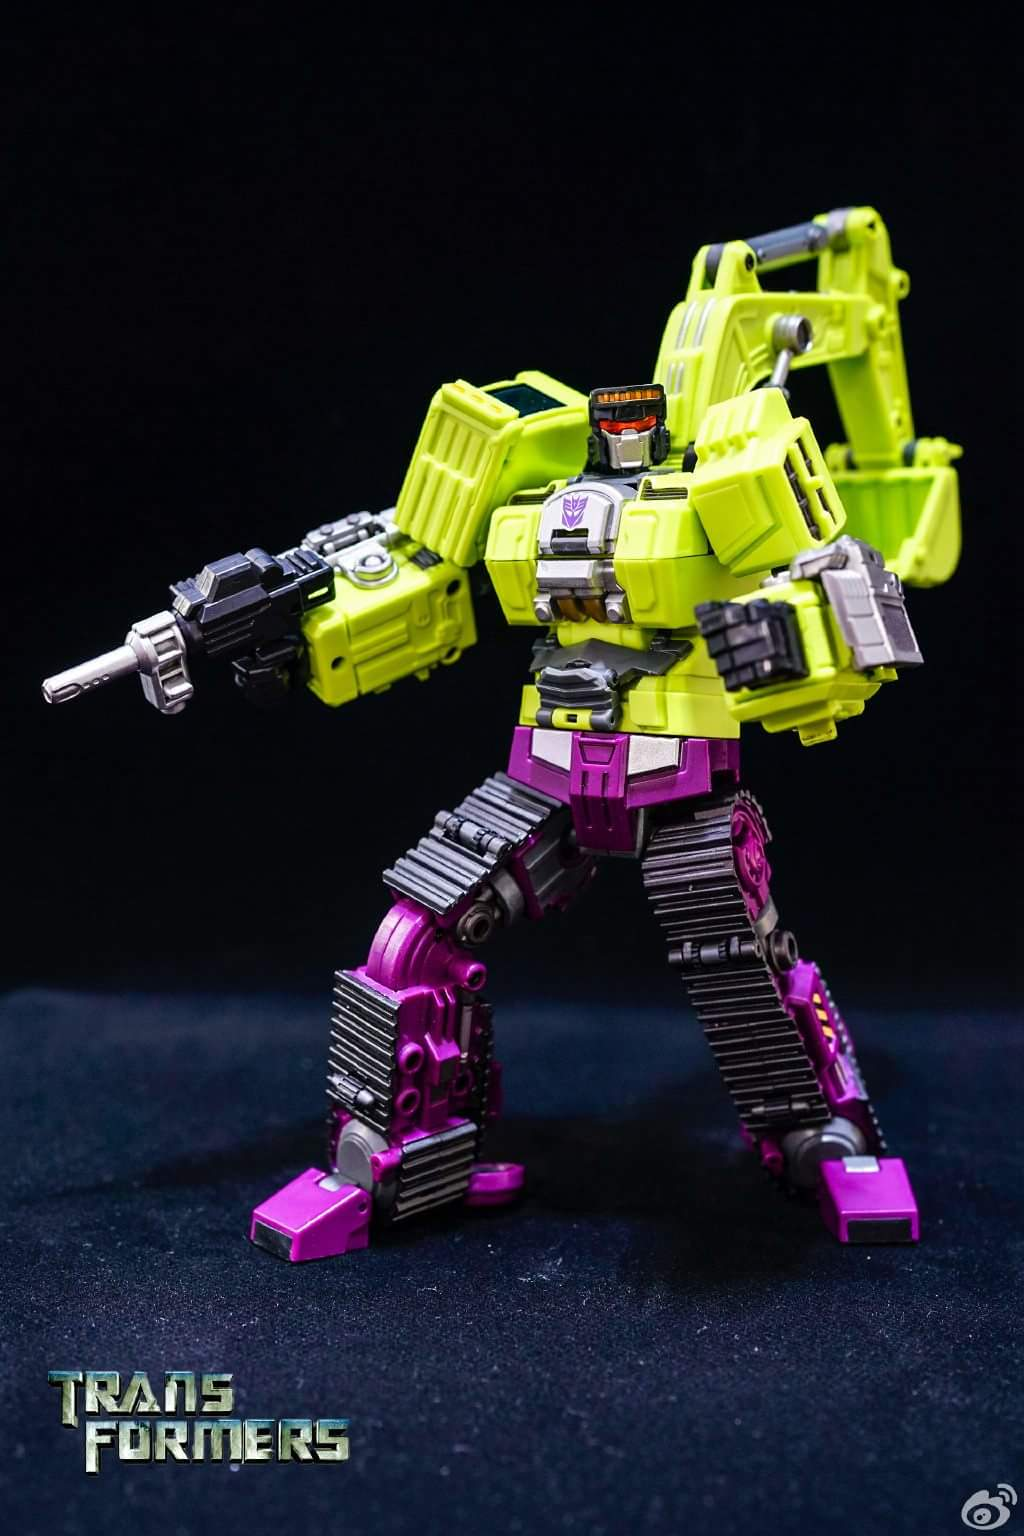 [Generation Toy] Produit Tiers - Jouet GT-01 Gravity Builder - aka Devastator/Dévastateur - Page 4 RskEpFZ8